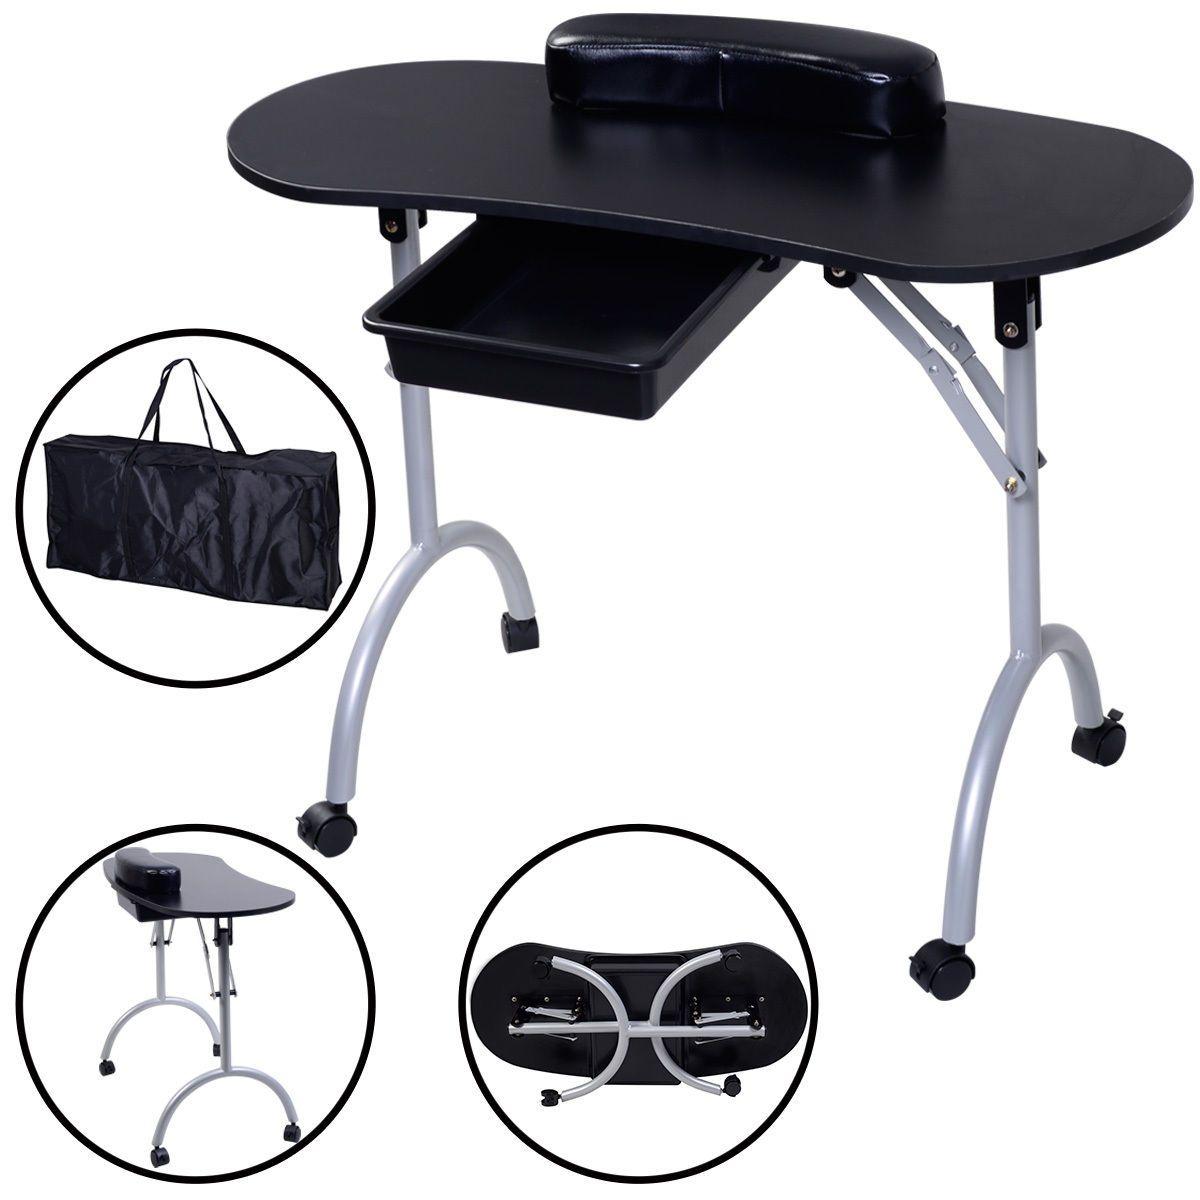 Portable Manicure Nail Table Station Desk Spa Beauty Salon Equipment 2 Color